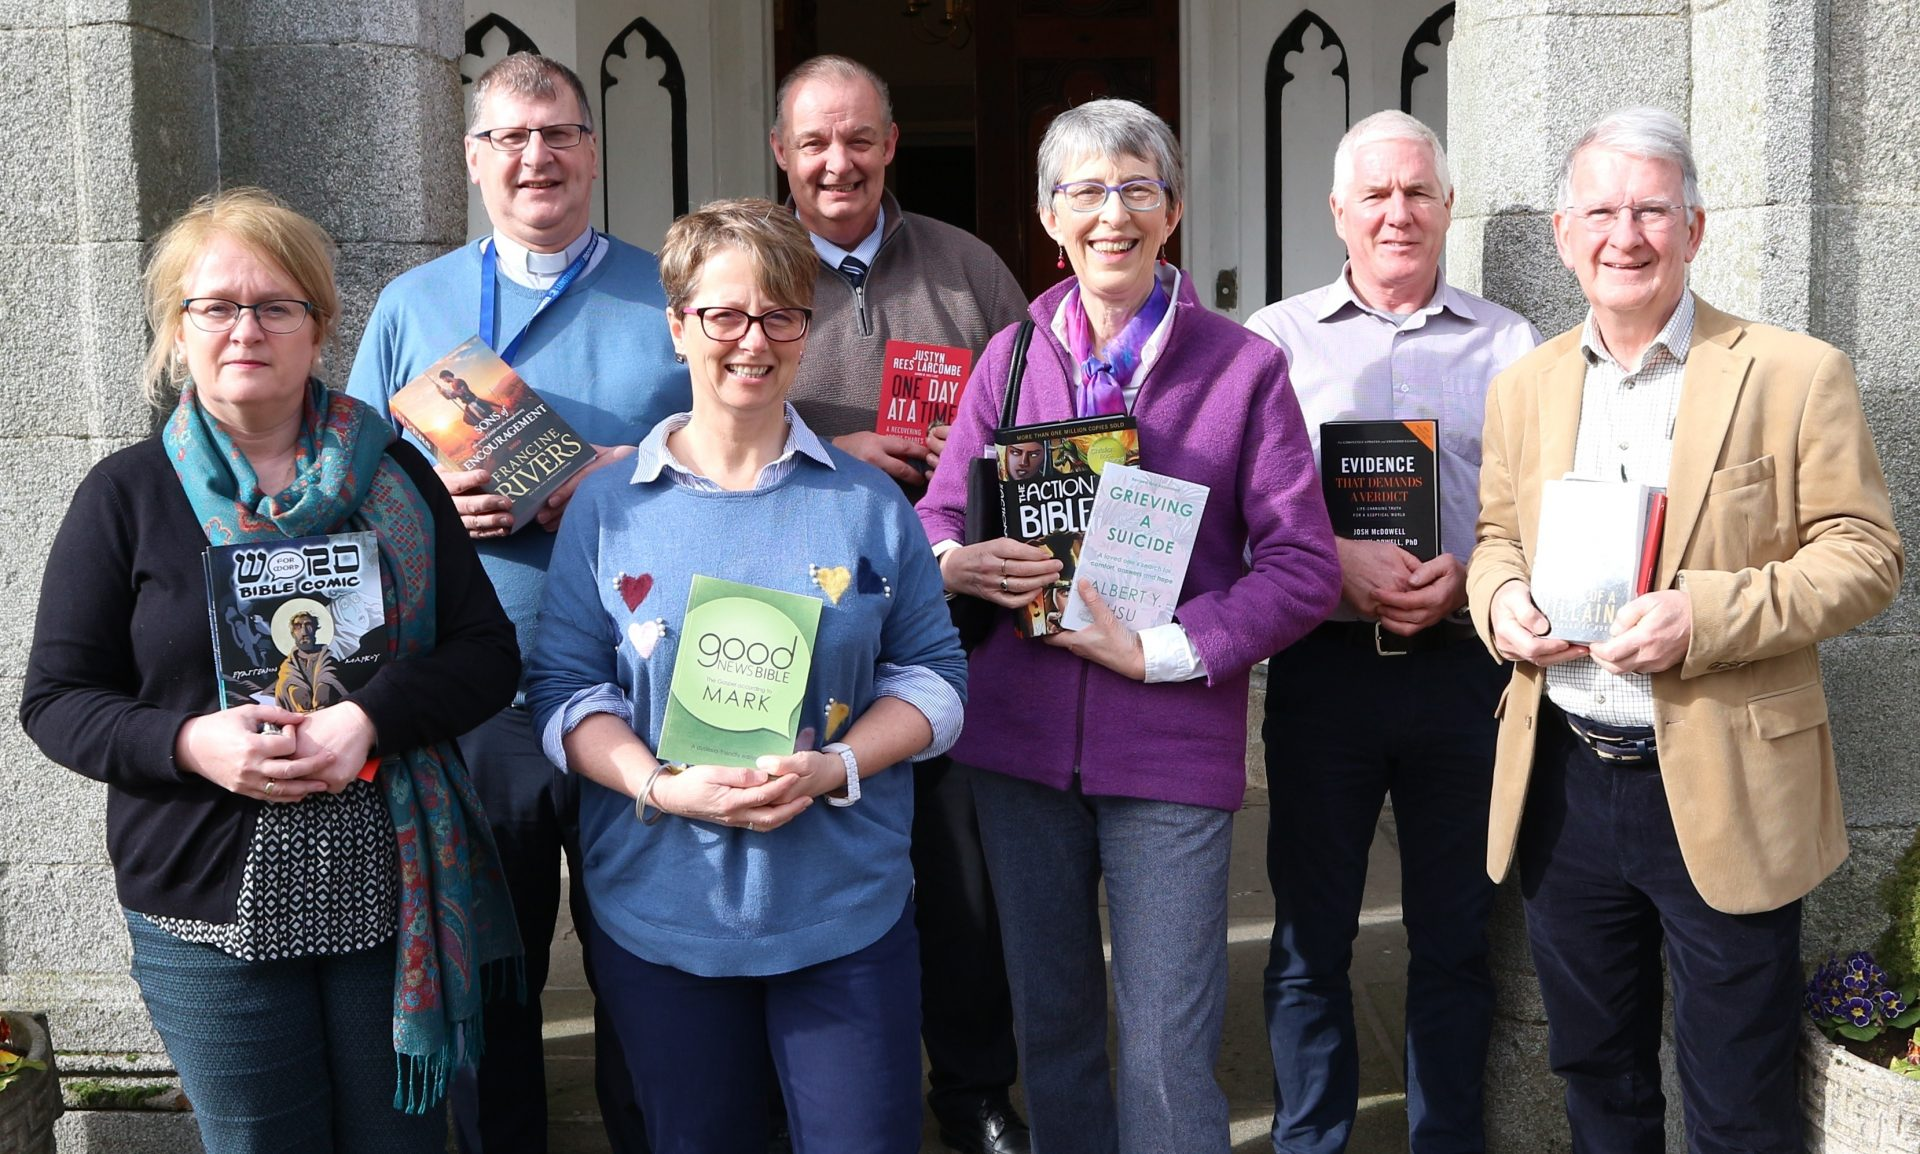 Christian Books into Prisons - Shelton Abbey - Buy Christian Books Online here